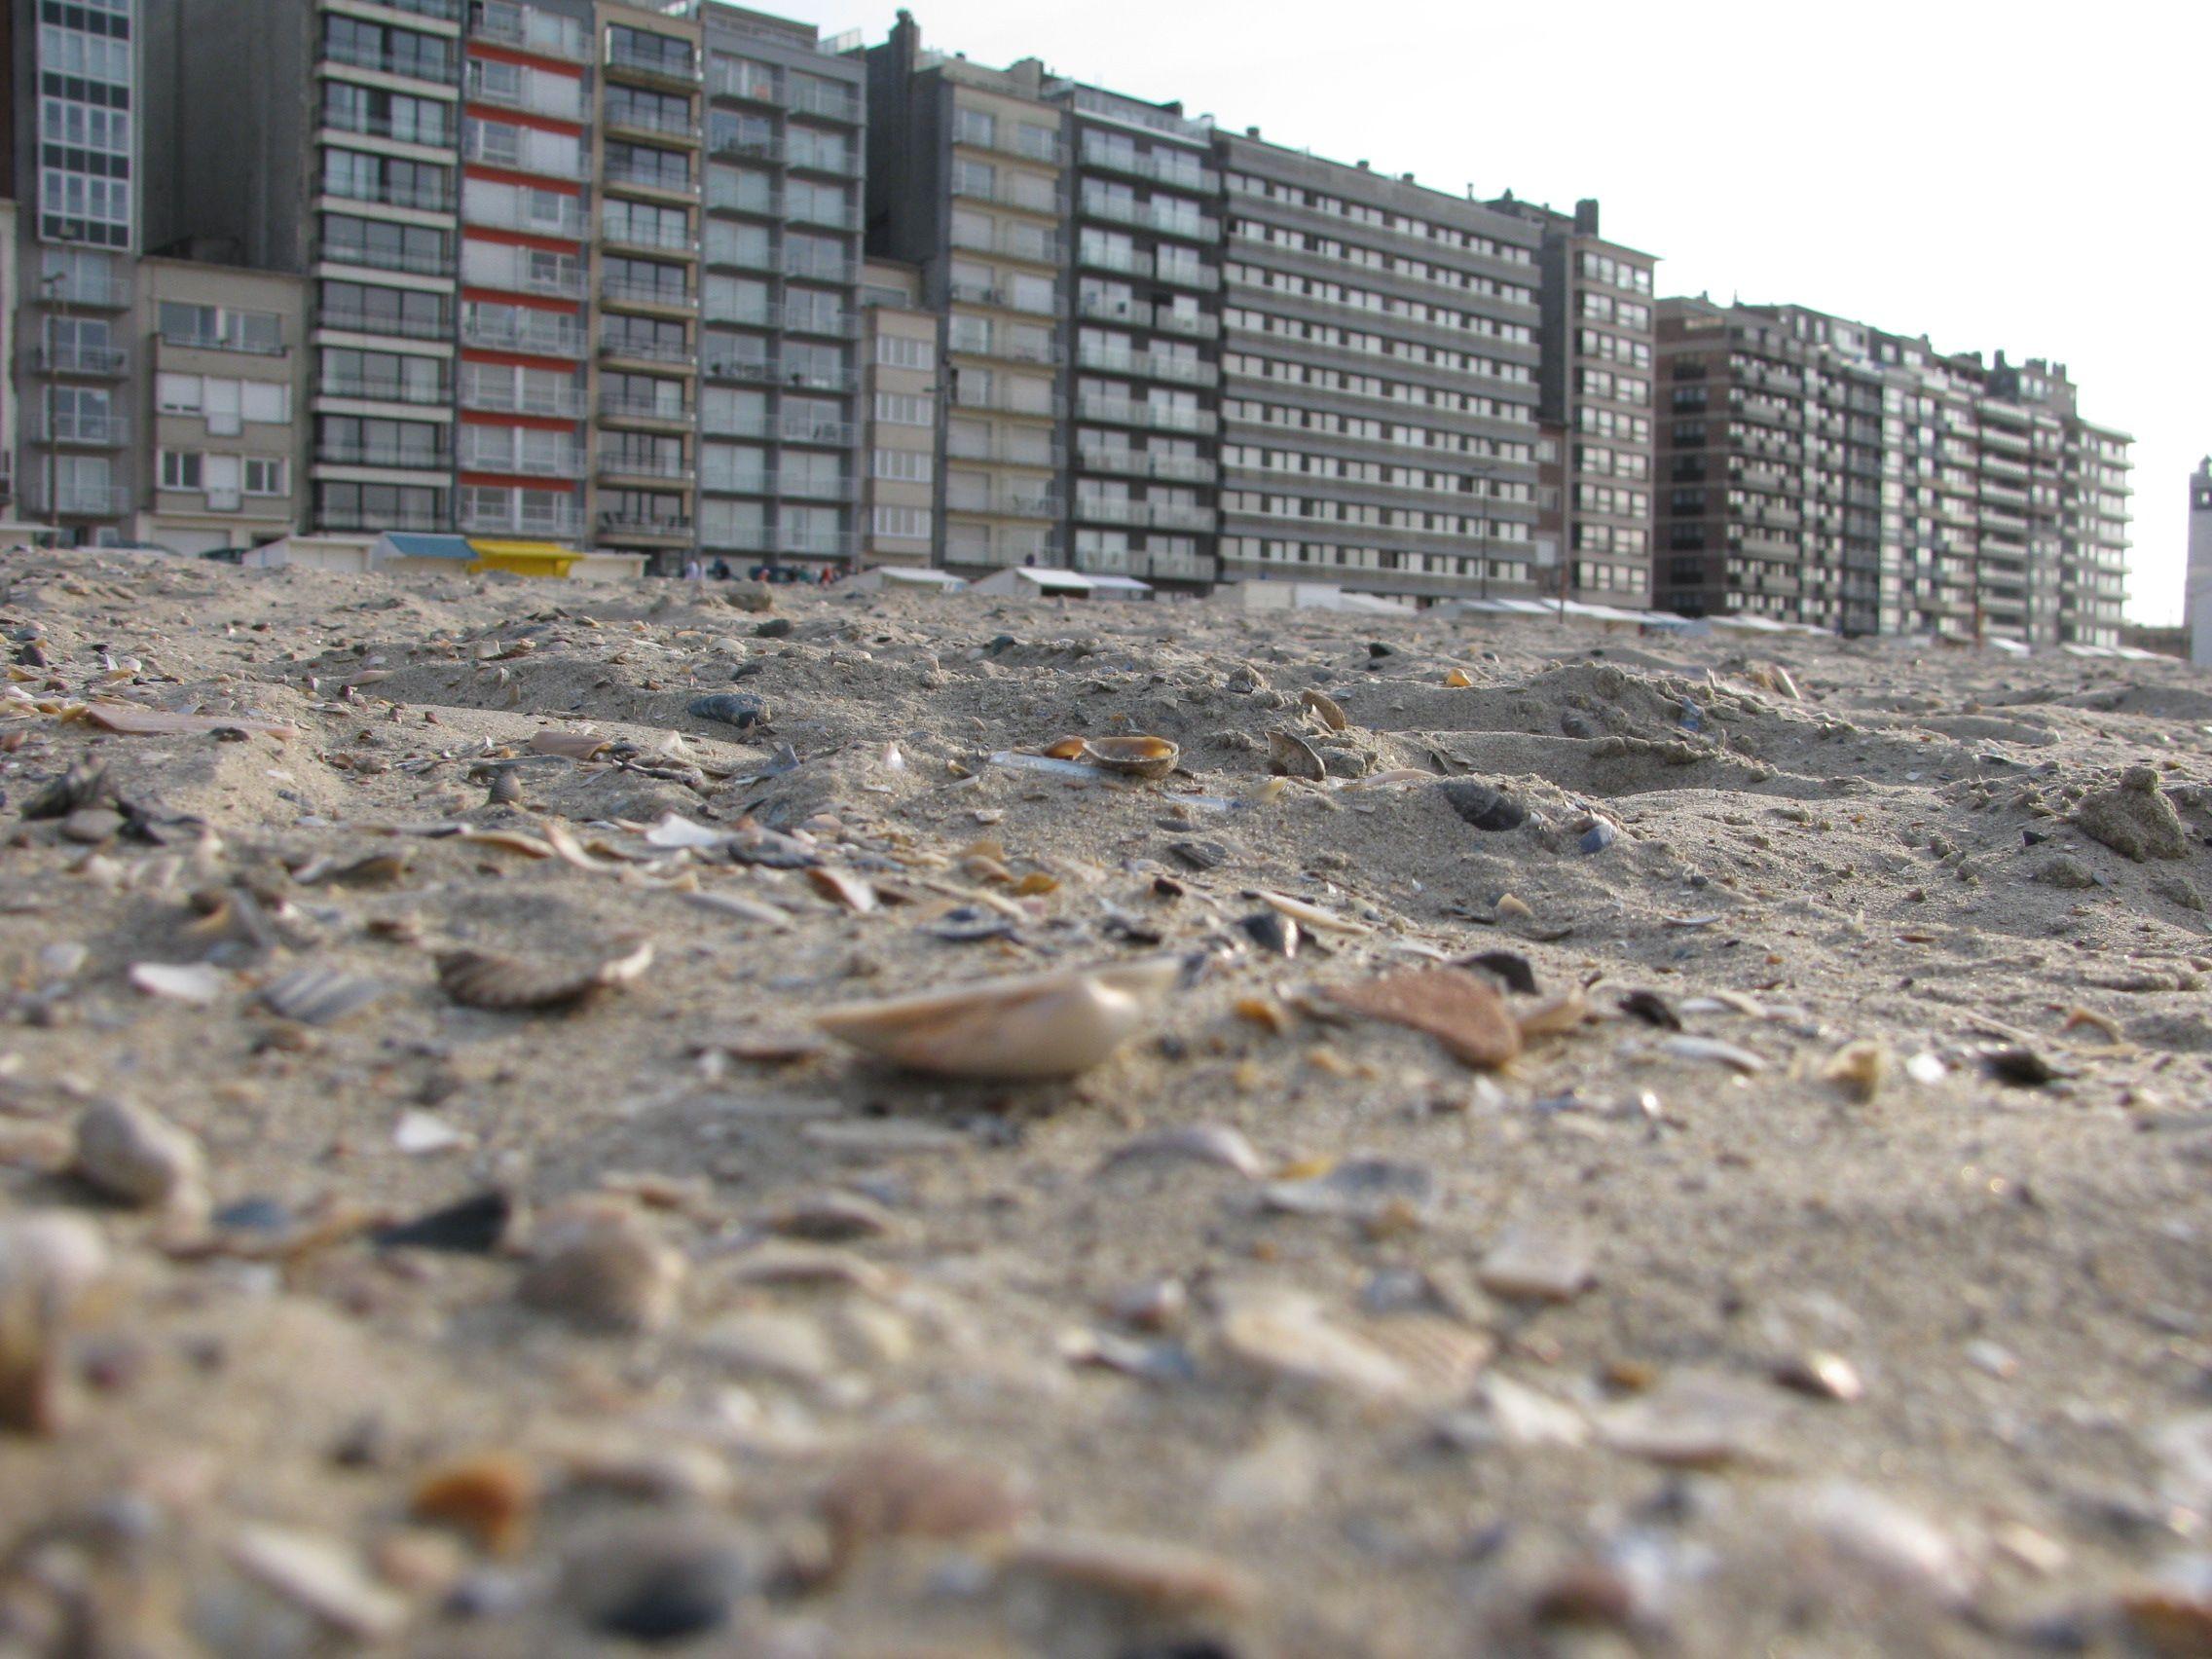 Shell on the beach, Belgium